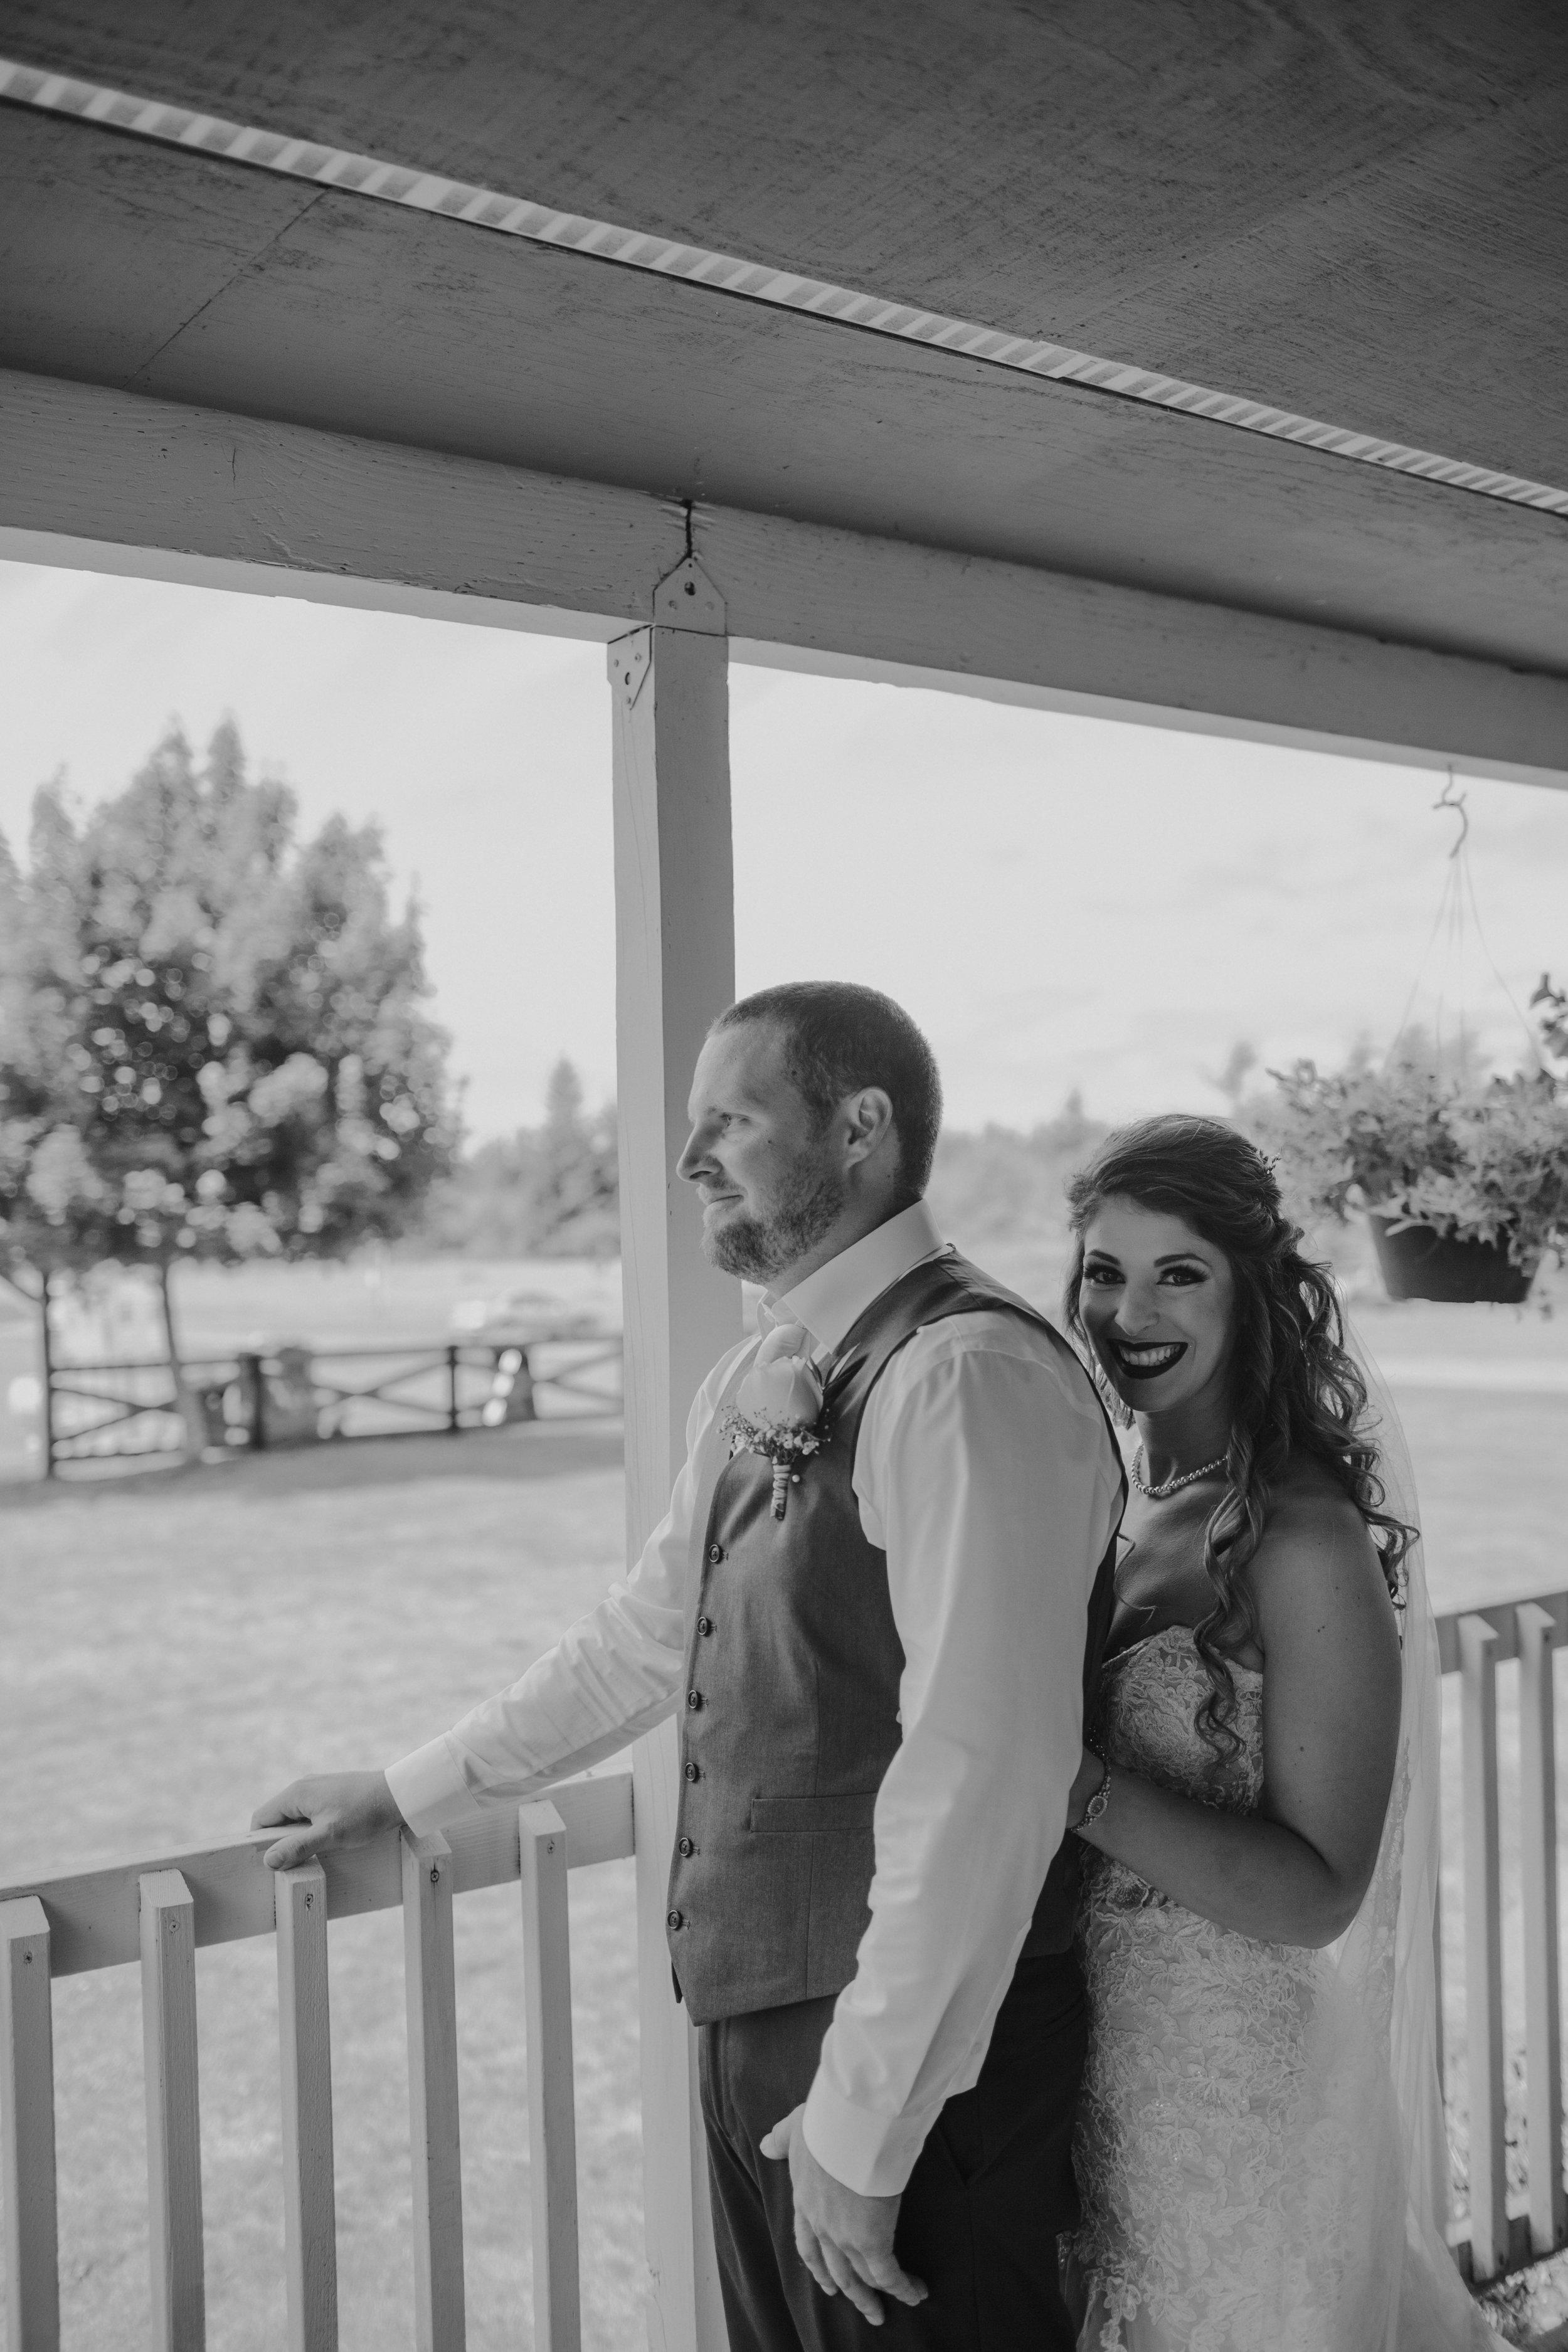 Olympic-Peninsula-Wedding-Photographer-PNW-Forks-Port-Angeles-Kayla-Dawn-Photography-engagement-Olympic-National-Park-157.jpg